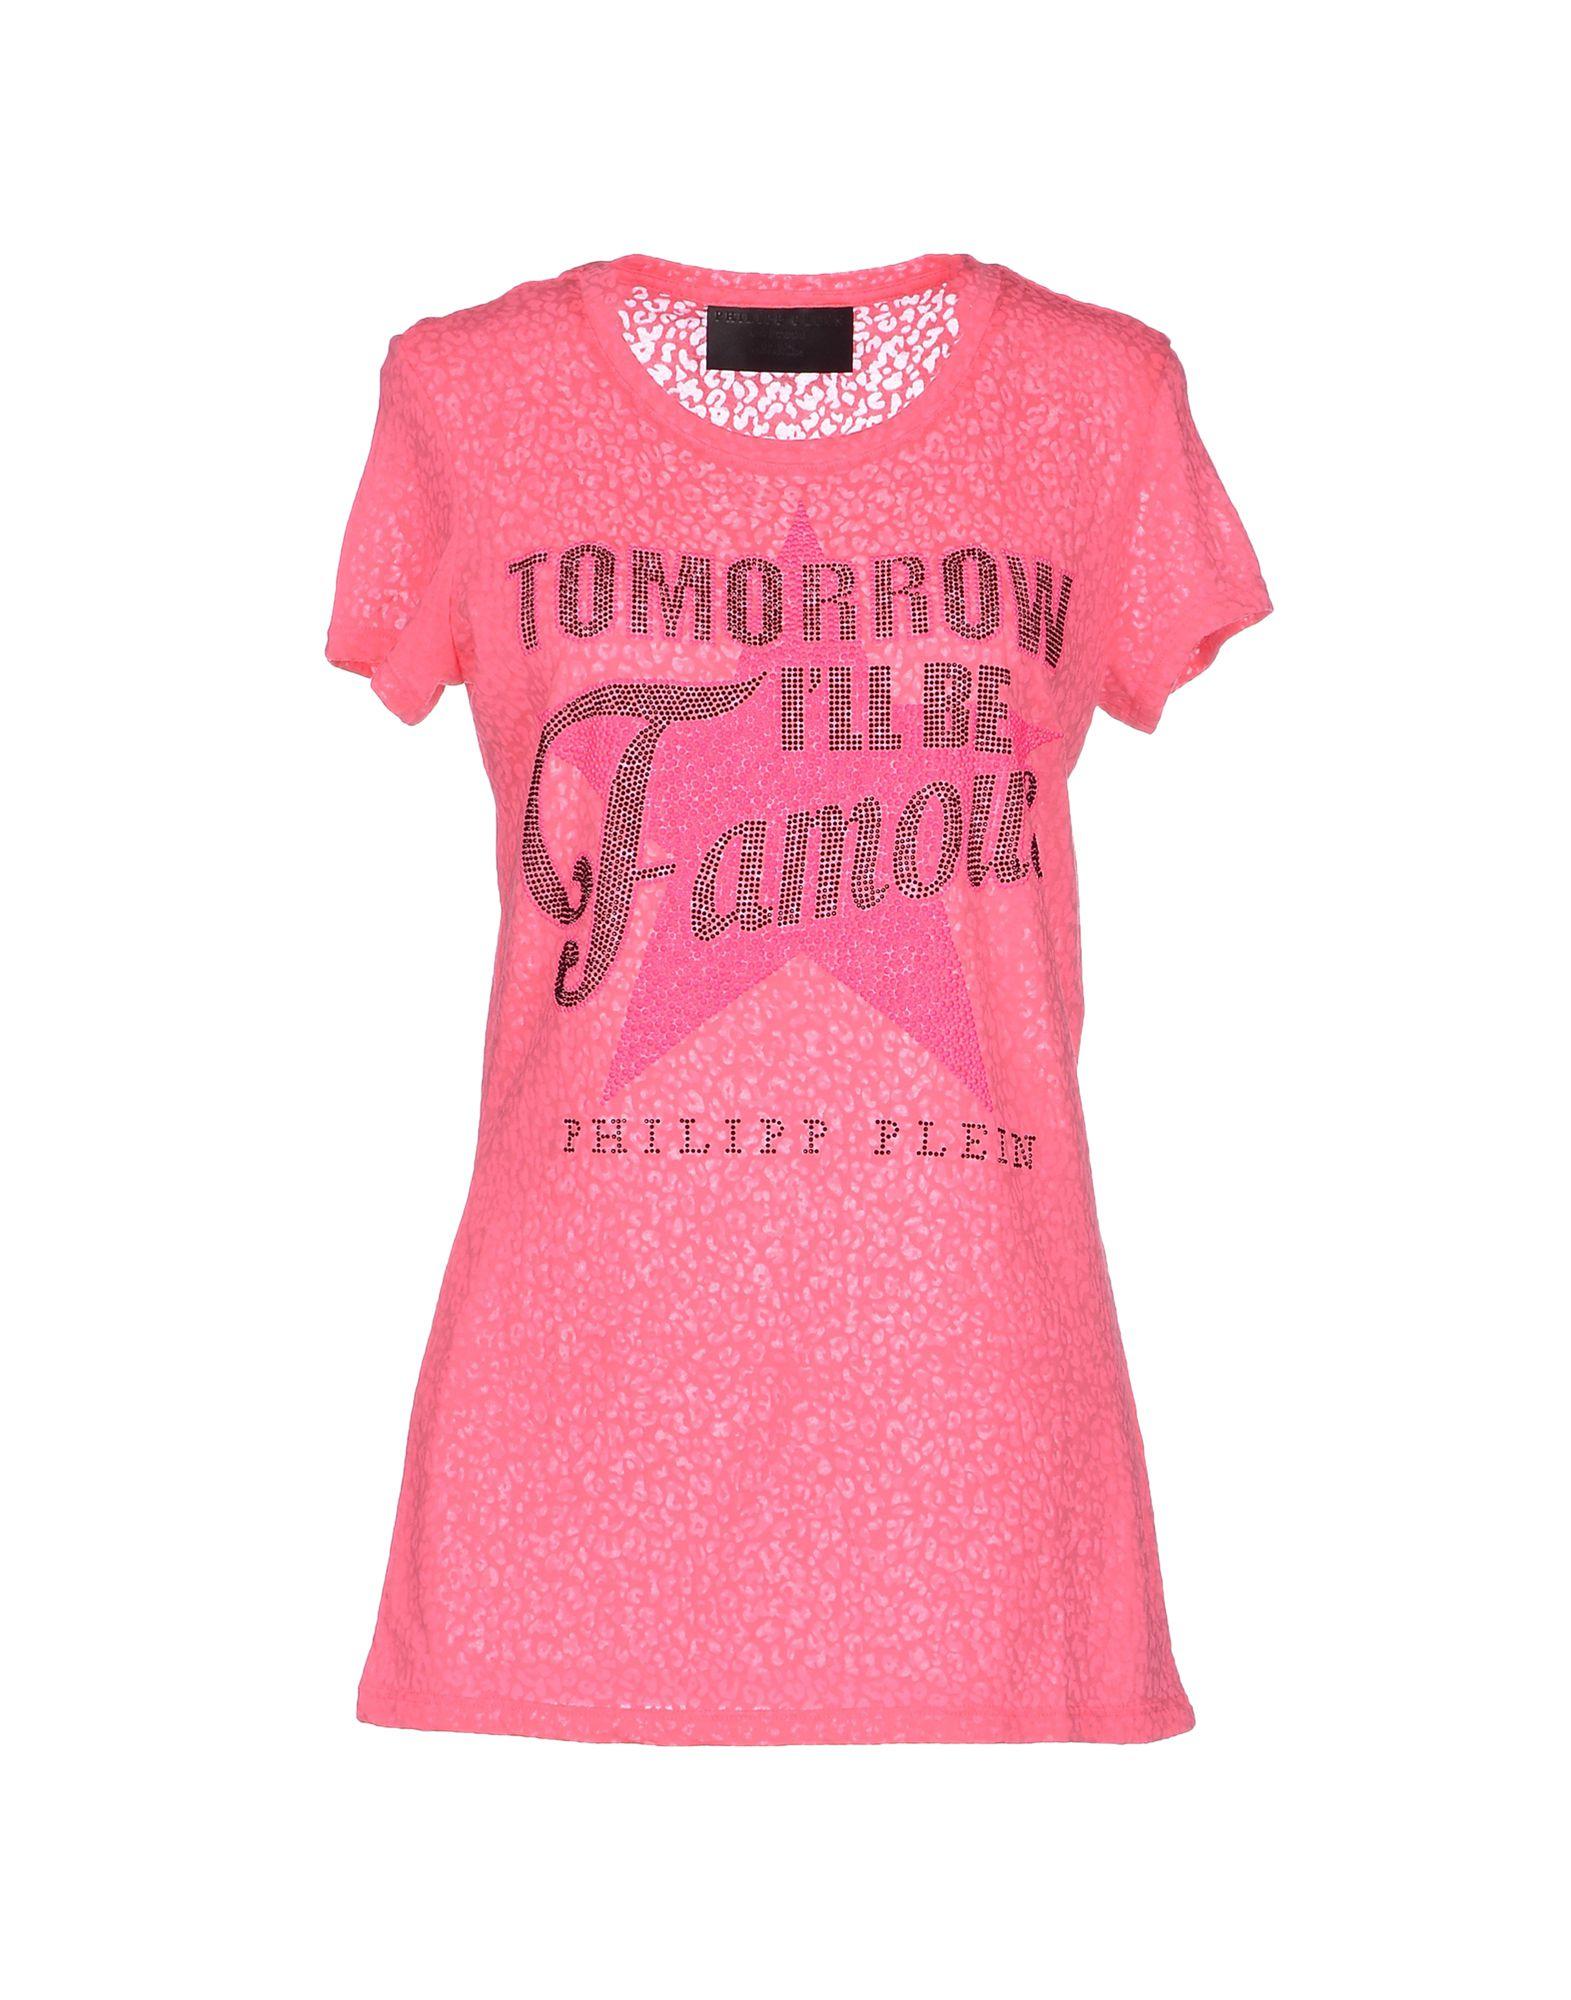 PHILIPP PLEIN COUTURE T-shirts